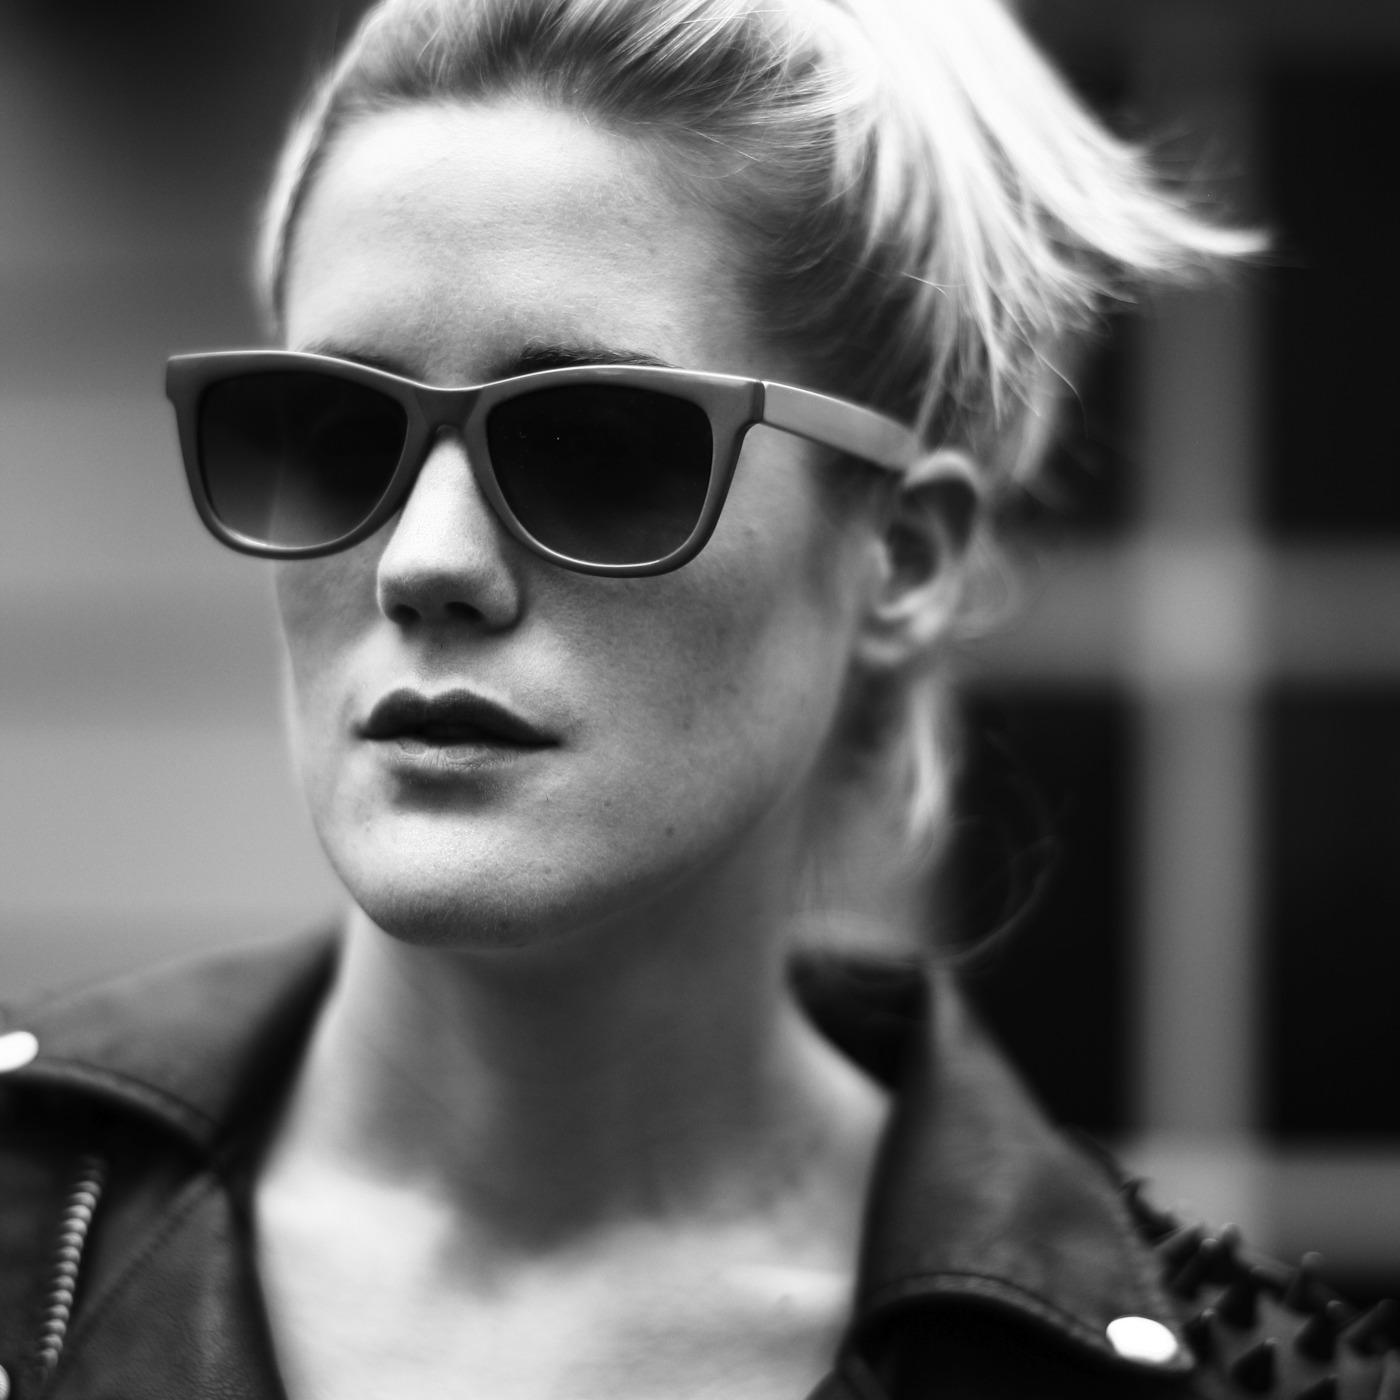 Samantha Baxley